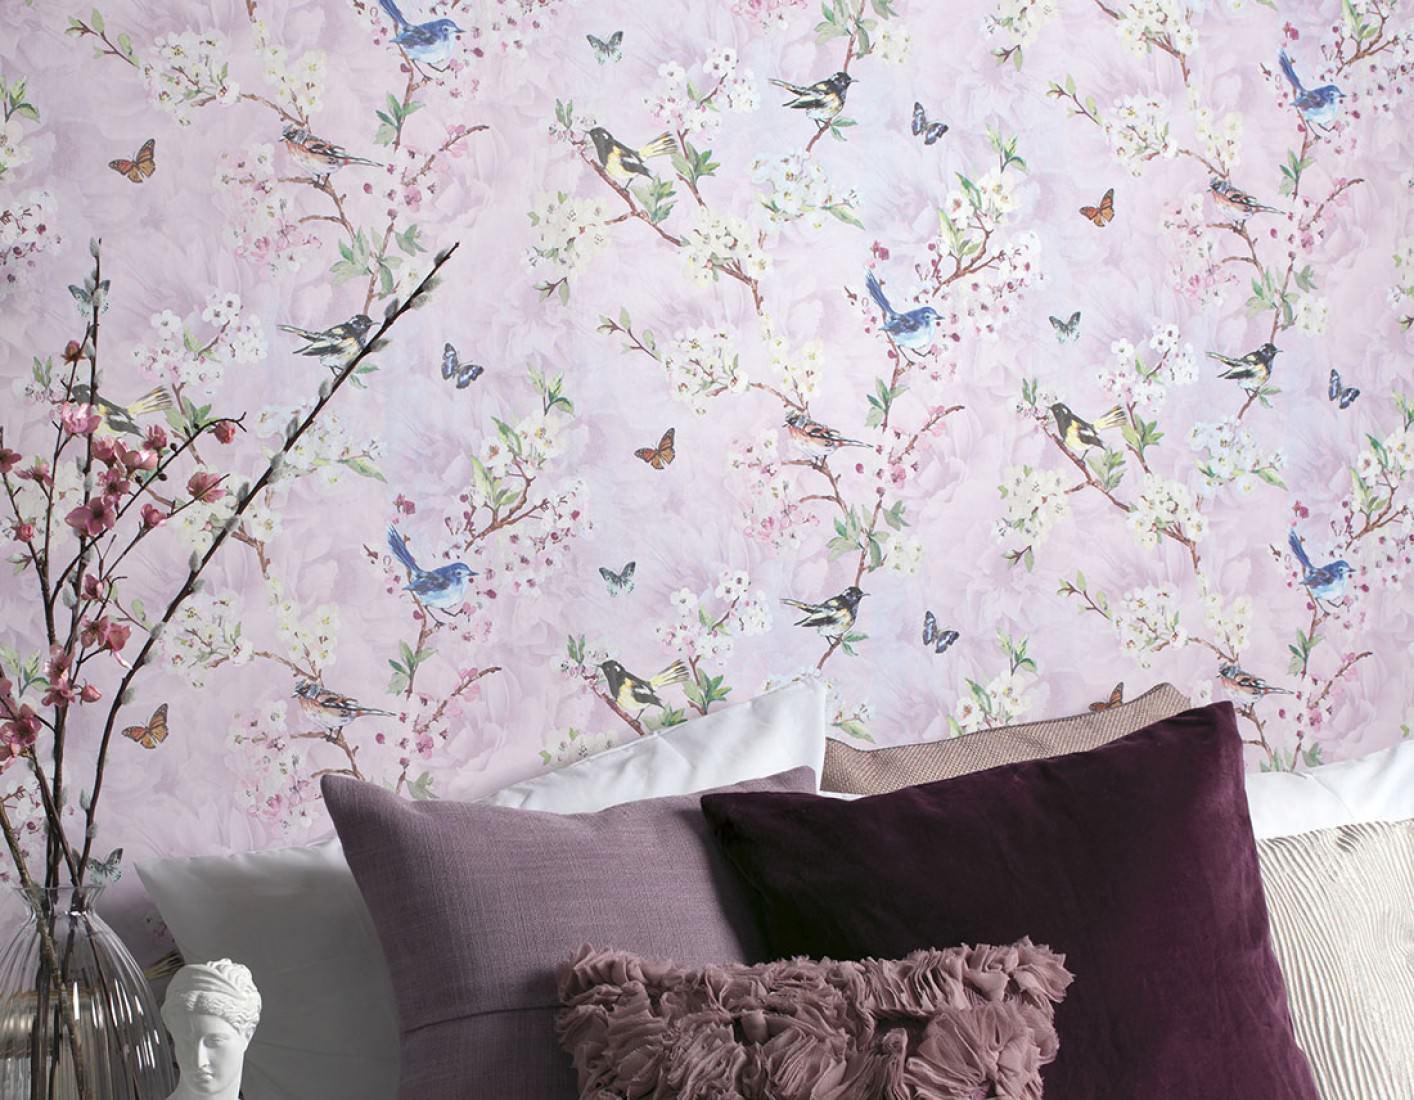 tapete helika violettweiss blassgelb blau braun gr n rotlila tapeten der 70er. Black Bedroom Furniture Sets. Home Design Ideas